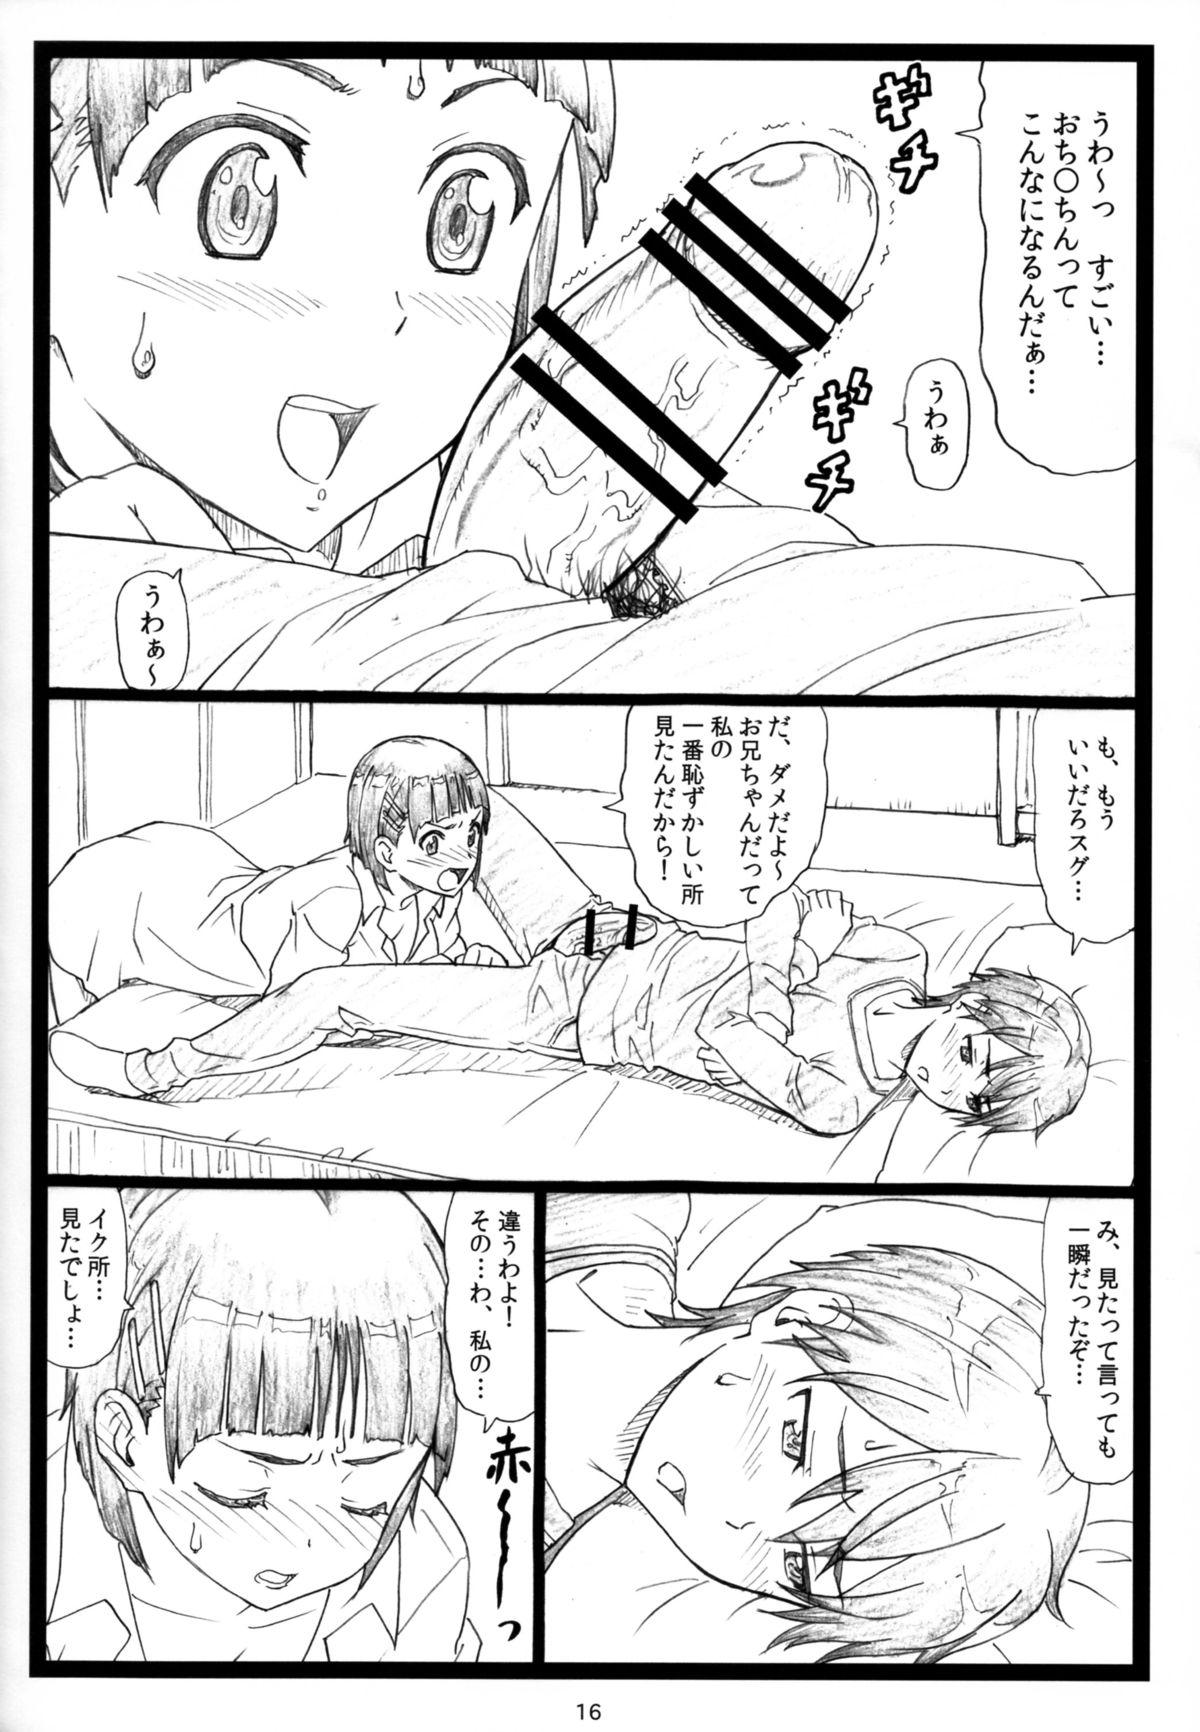 Kuzuha 15